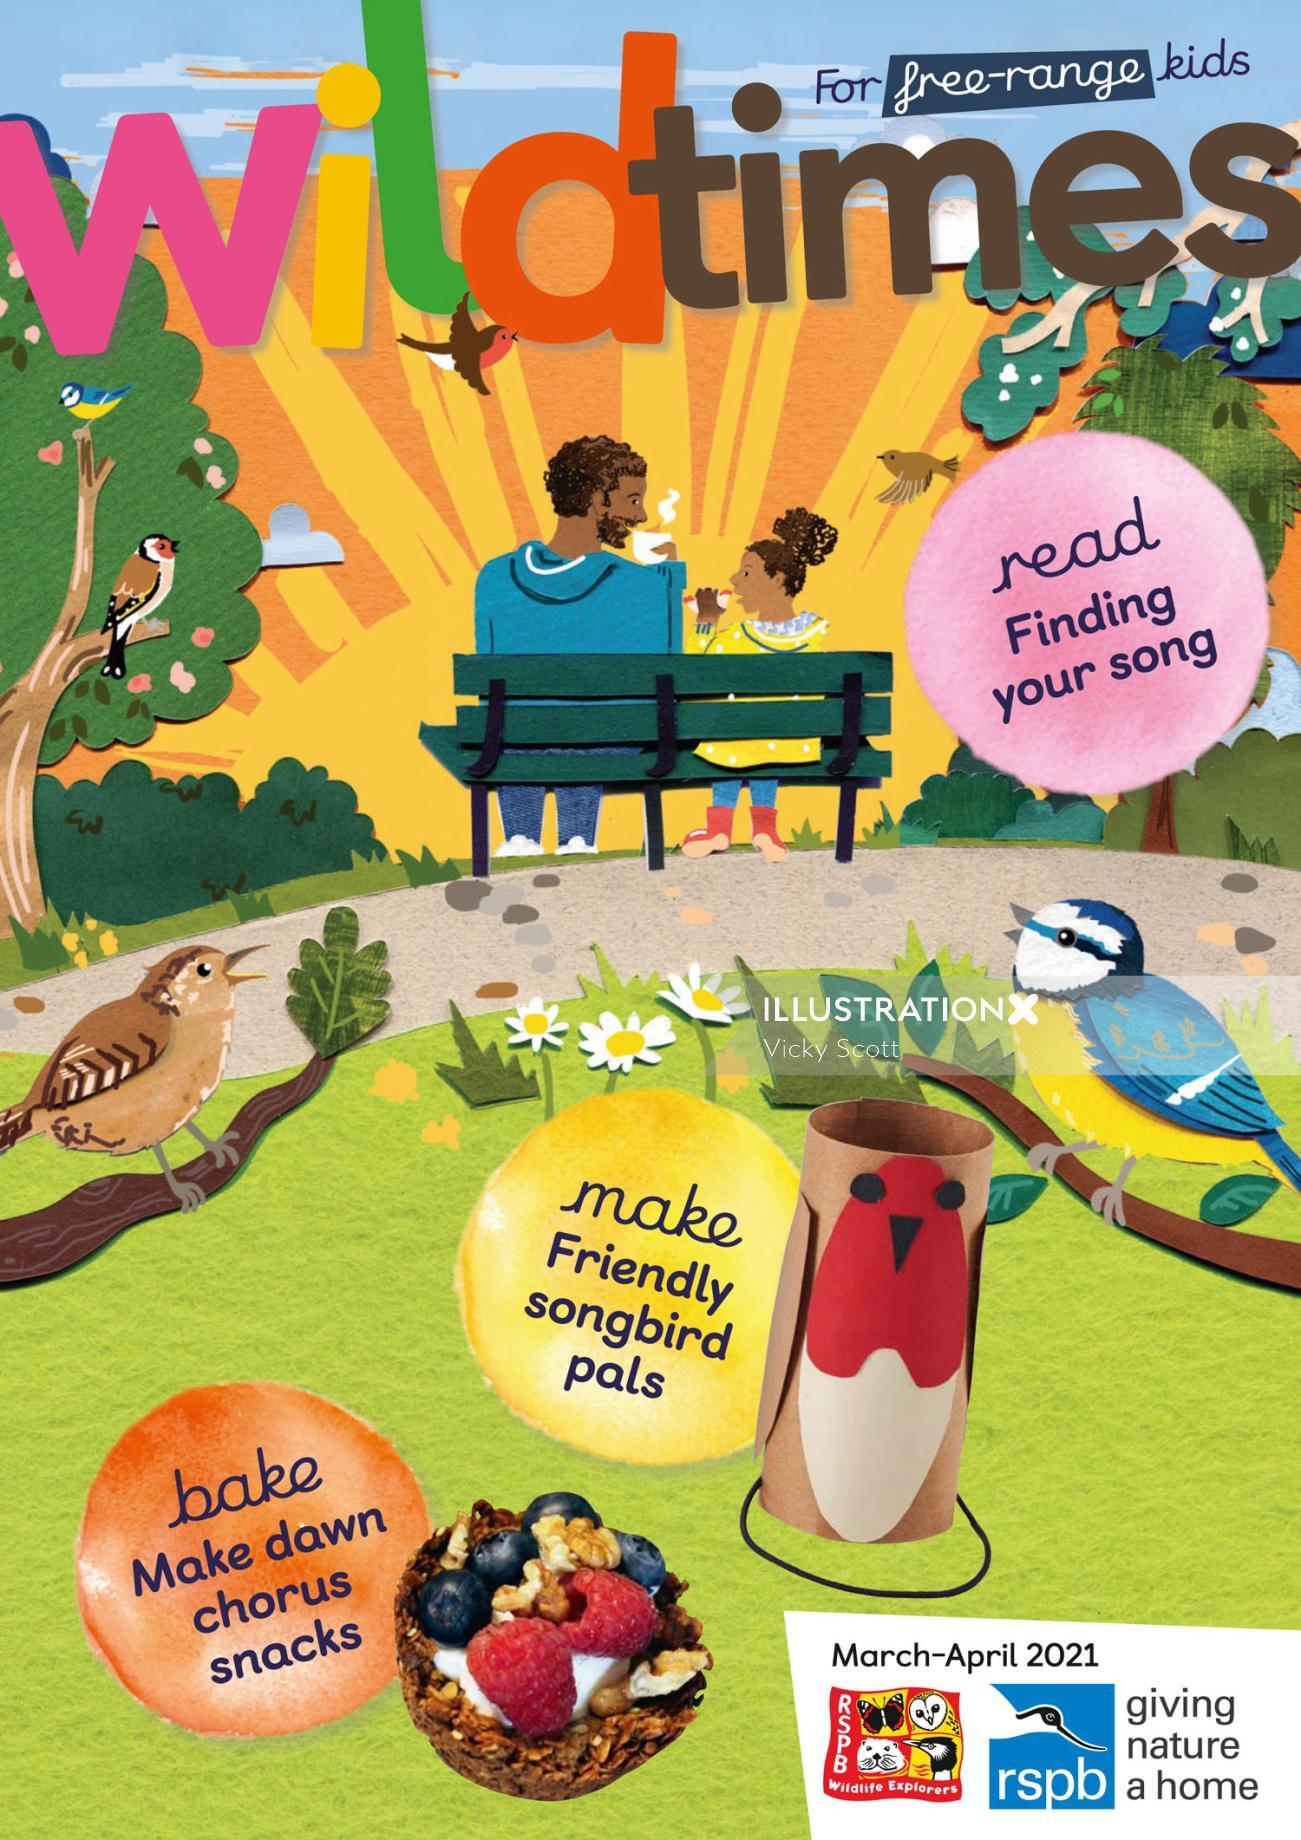 birds, children, sun, family, wildlife, nature, dawn chorus, trees, robin, bluetit